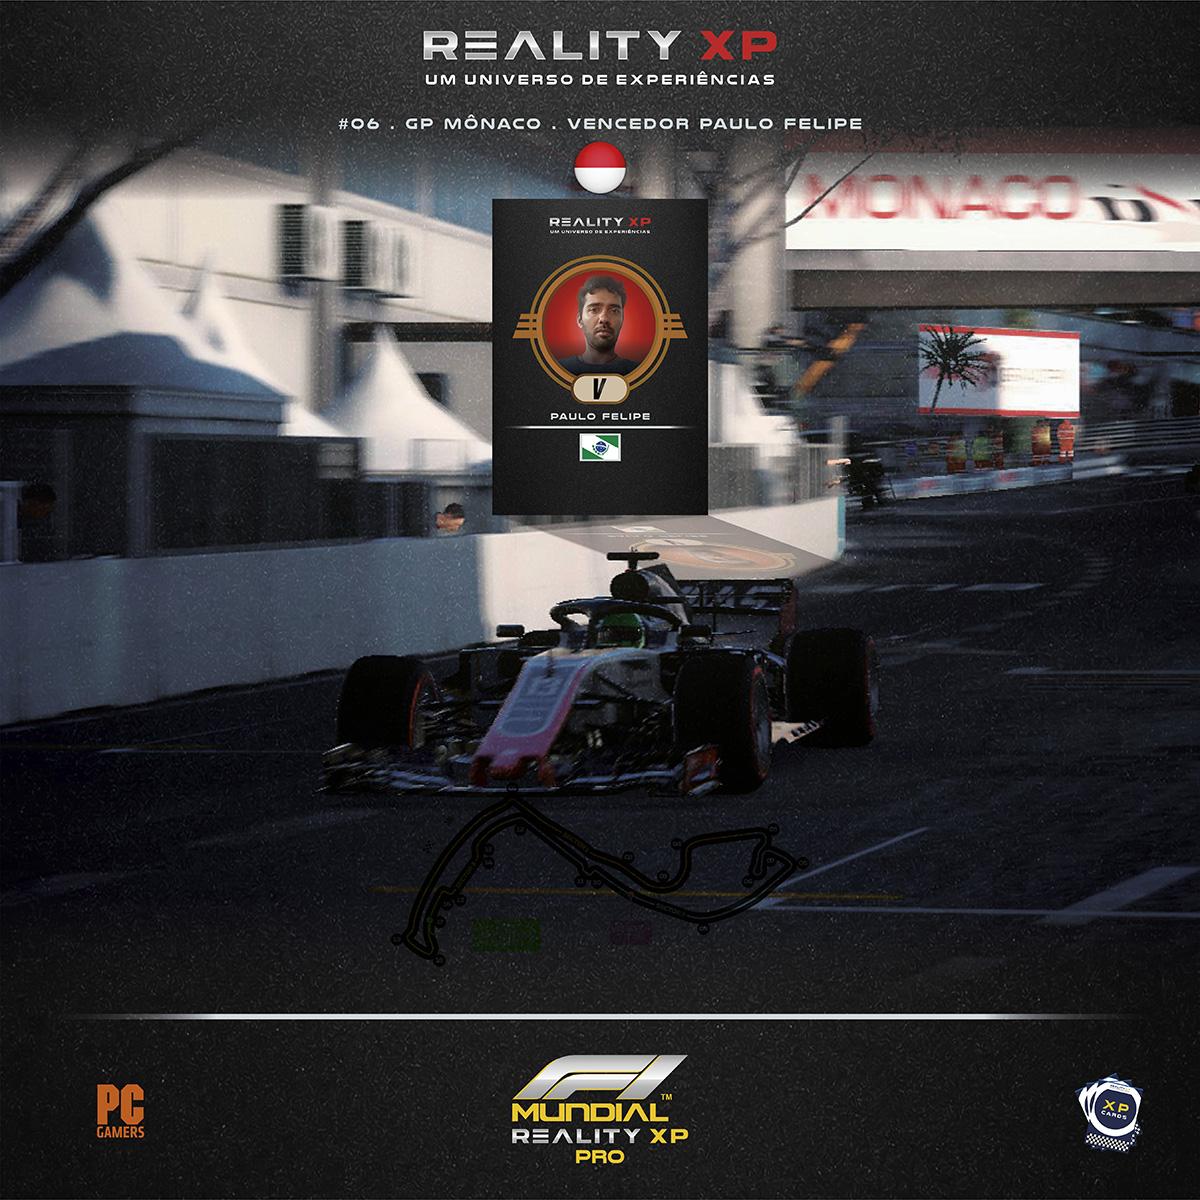 RealityXP_Mundial_RS_PC_PRO_ETAPA_6_2